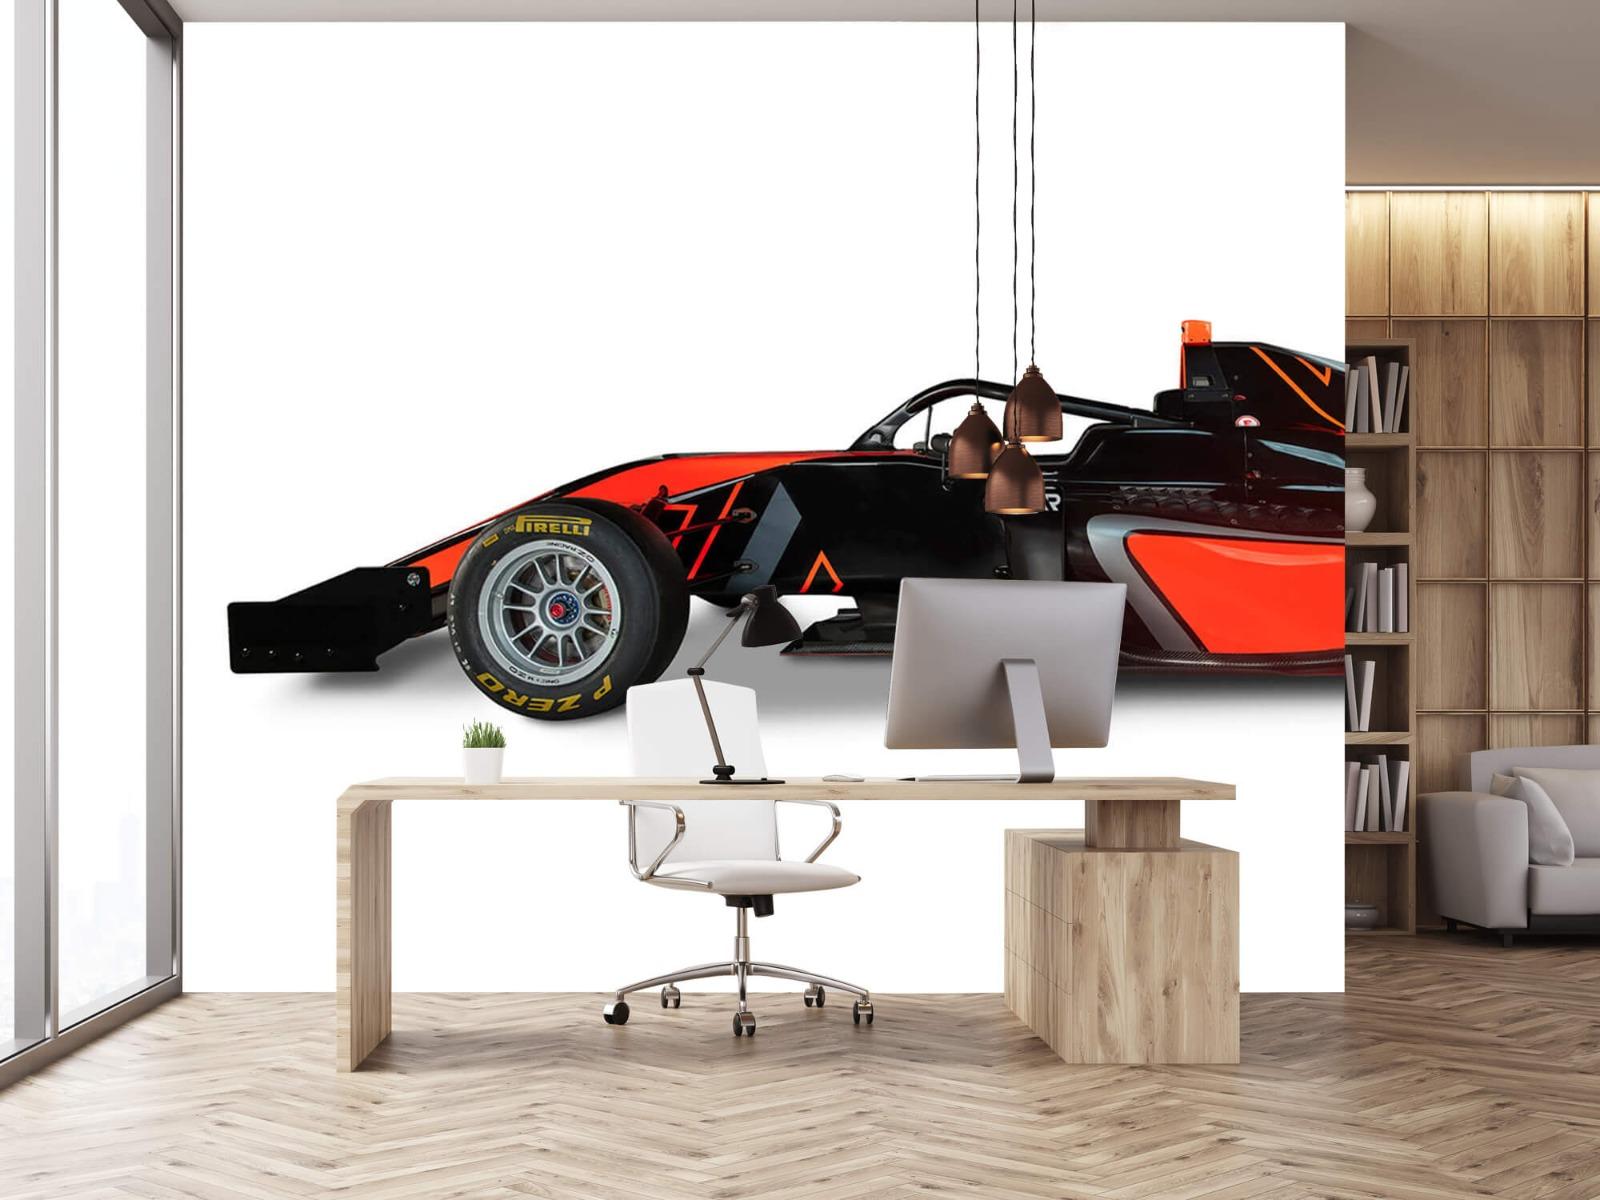 Sportauto's - Formule 3 - Lower side view - Computerruimte 24